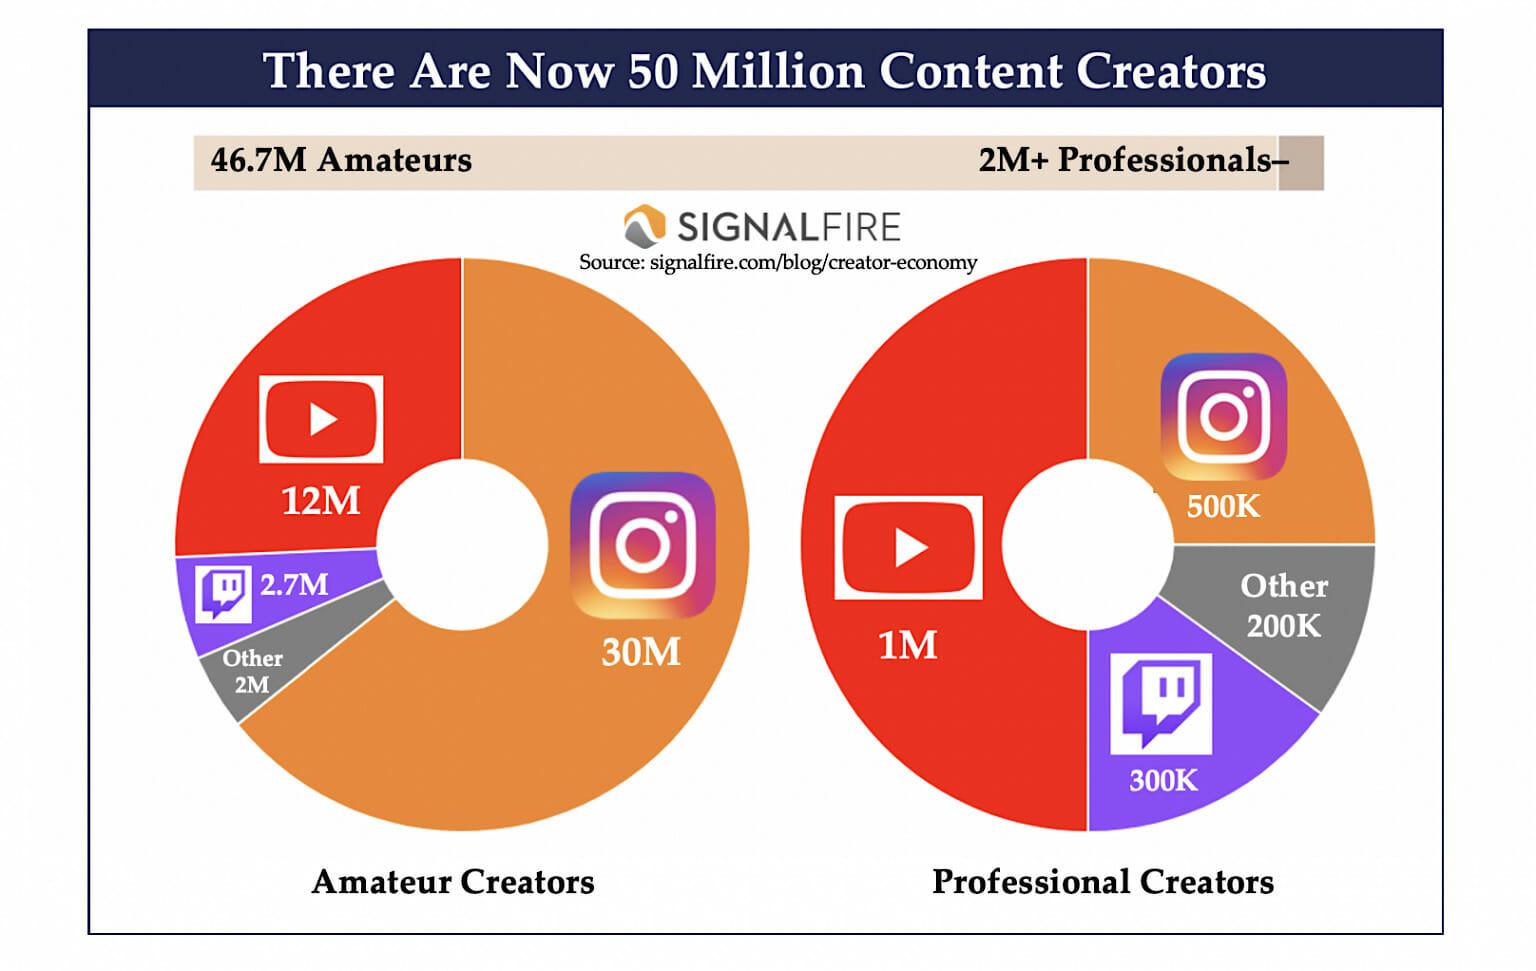 SignalFire-How-Many-Creators-Are-There - creator economy